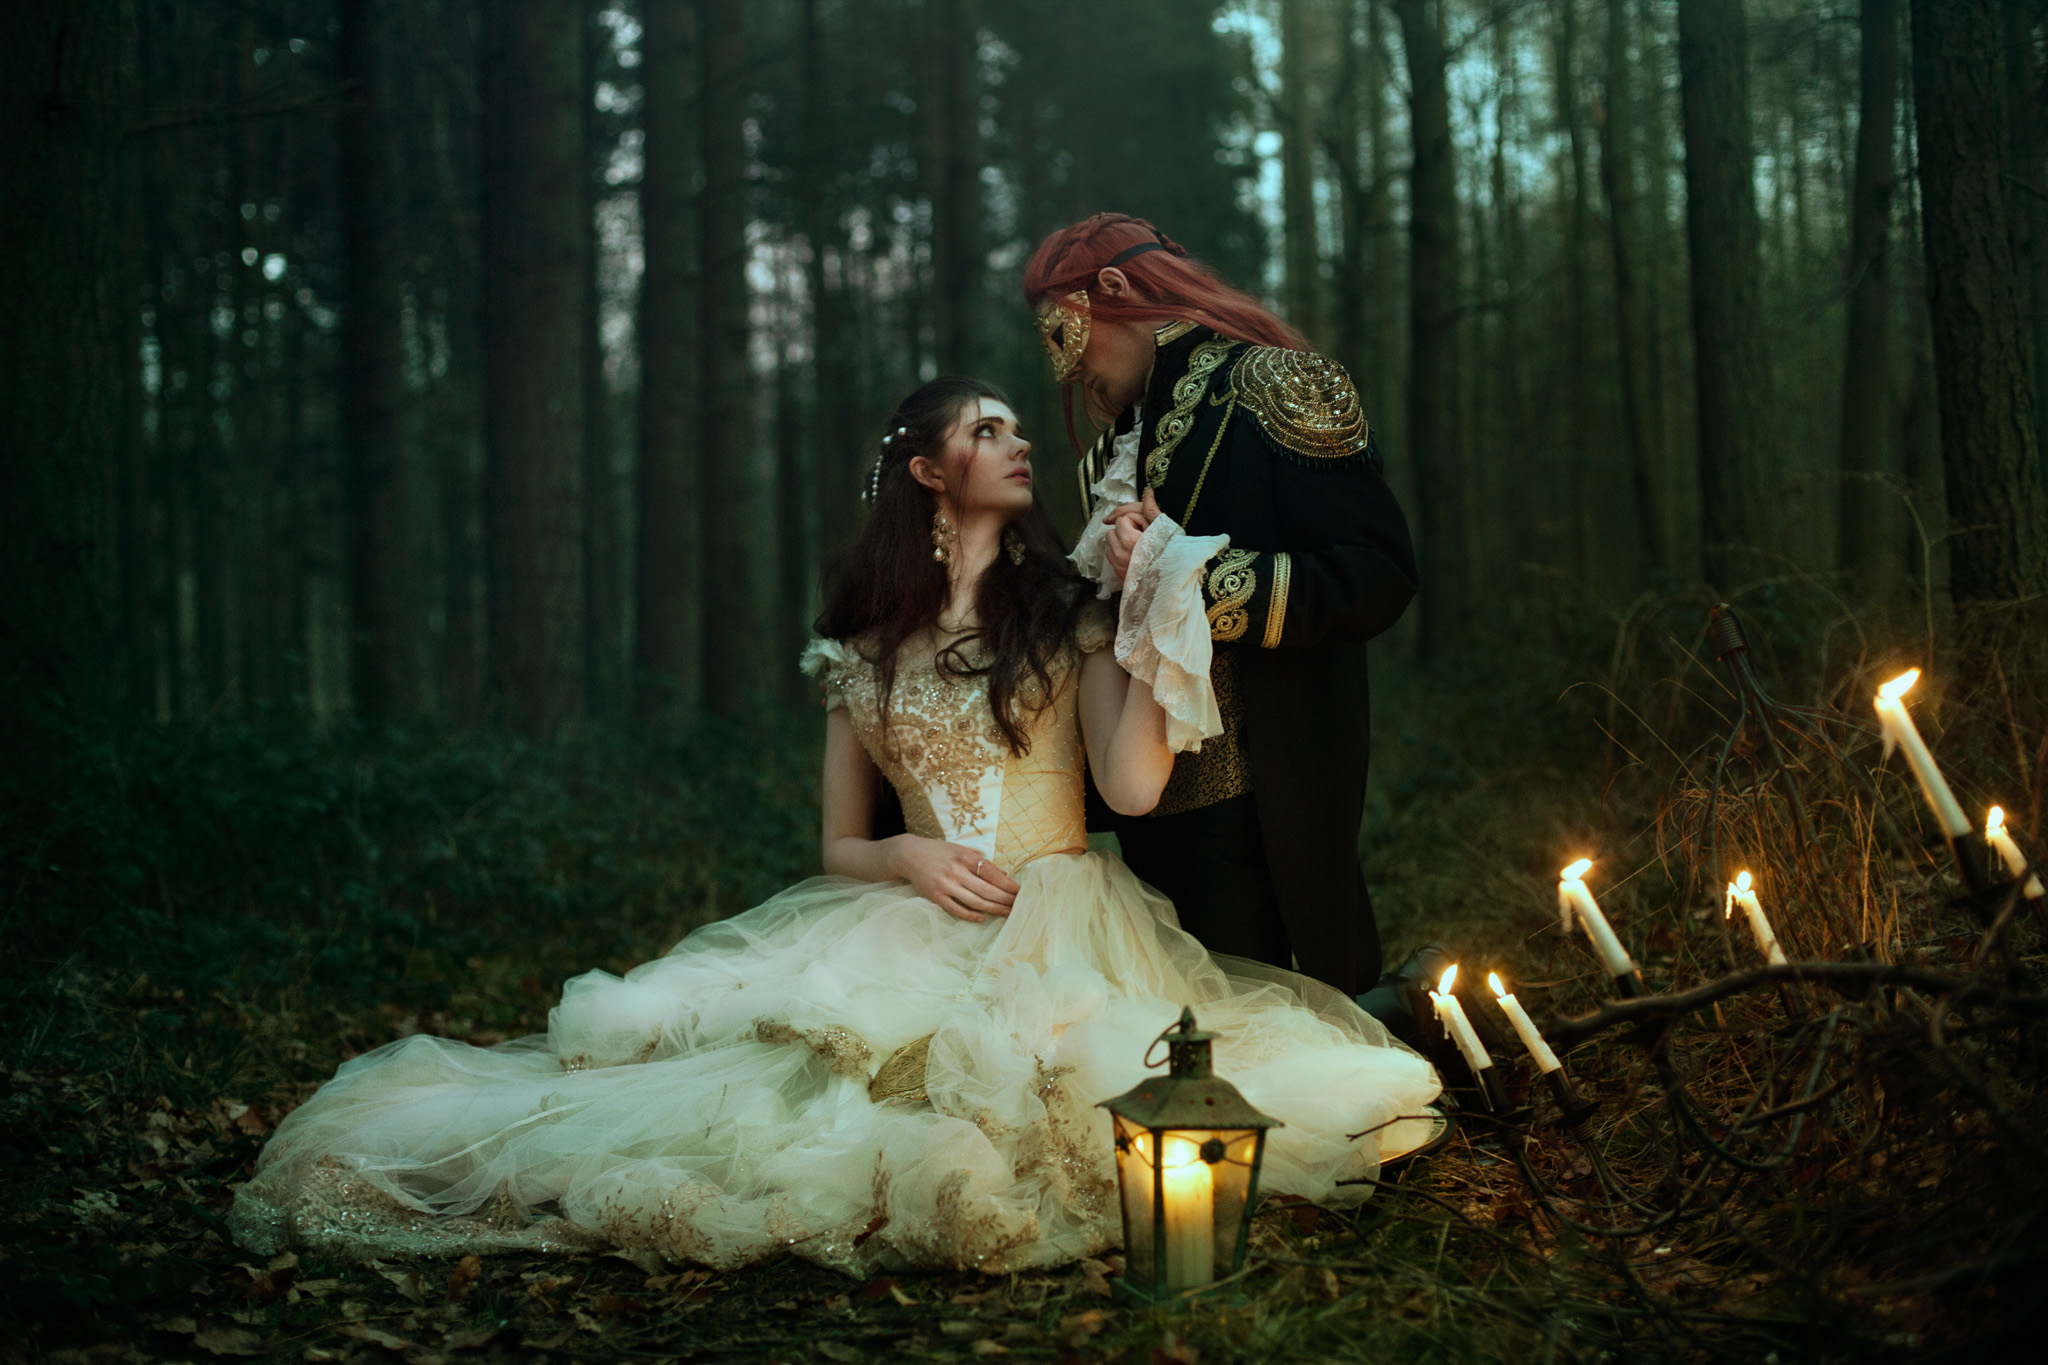 bella-kotak-fairytale-fairytales-labyrinth-david-bowie-sarah-beauty-beast-magic-magical-faerie-magazine-editorial-firefly-path-twilight-woods-lantern-ethereal-fairy-disney-ian-hencher-10s.jpg